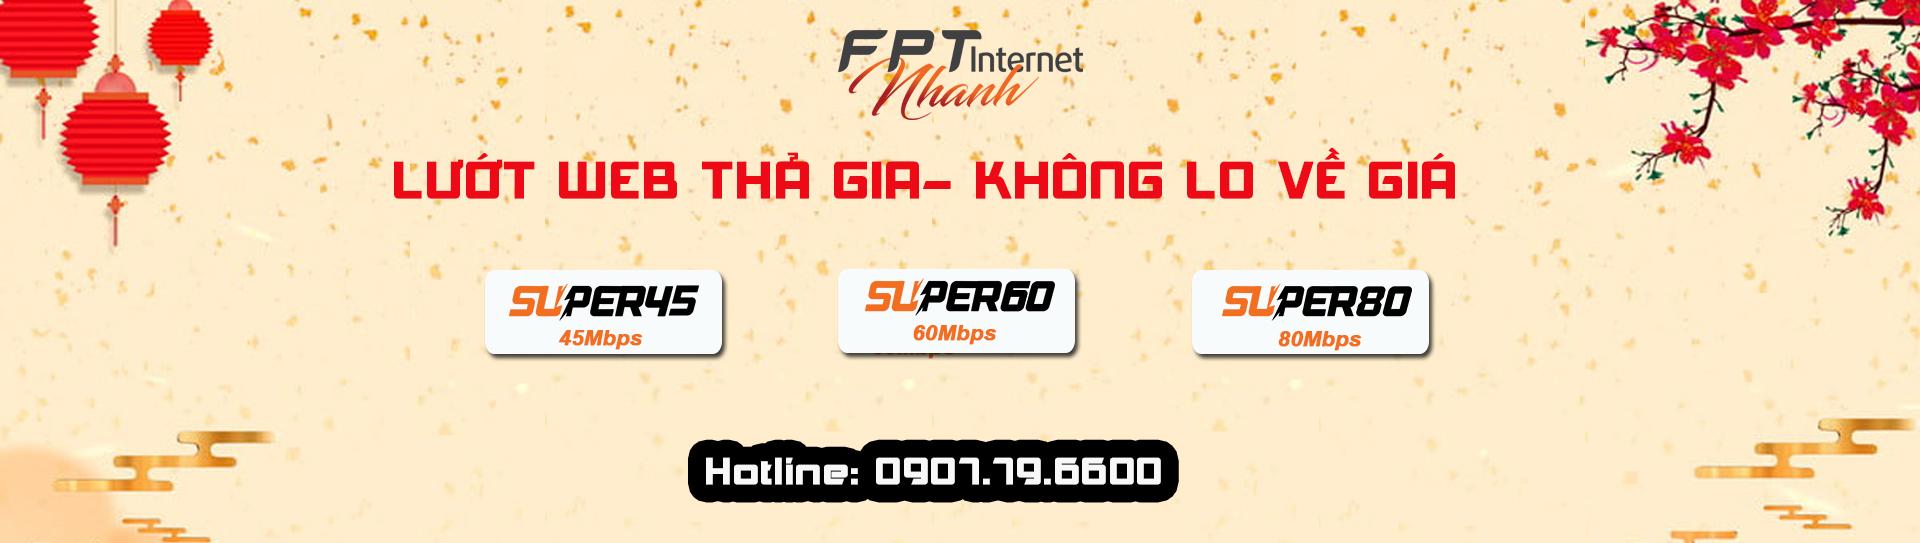 Internet FPT Telecom